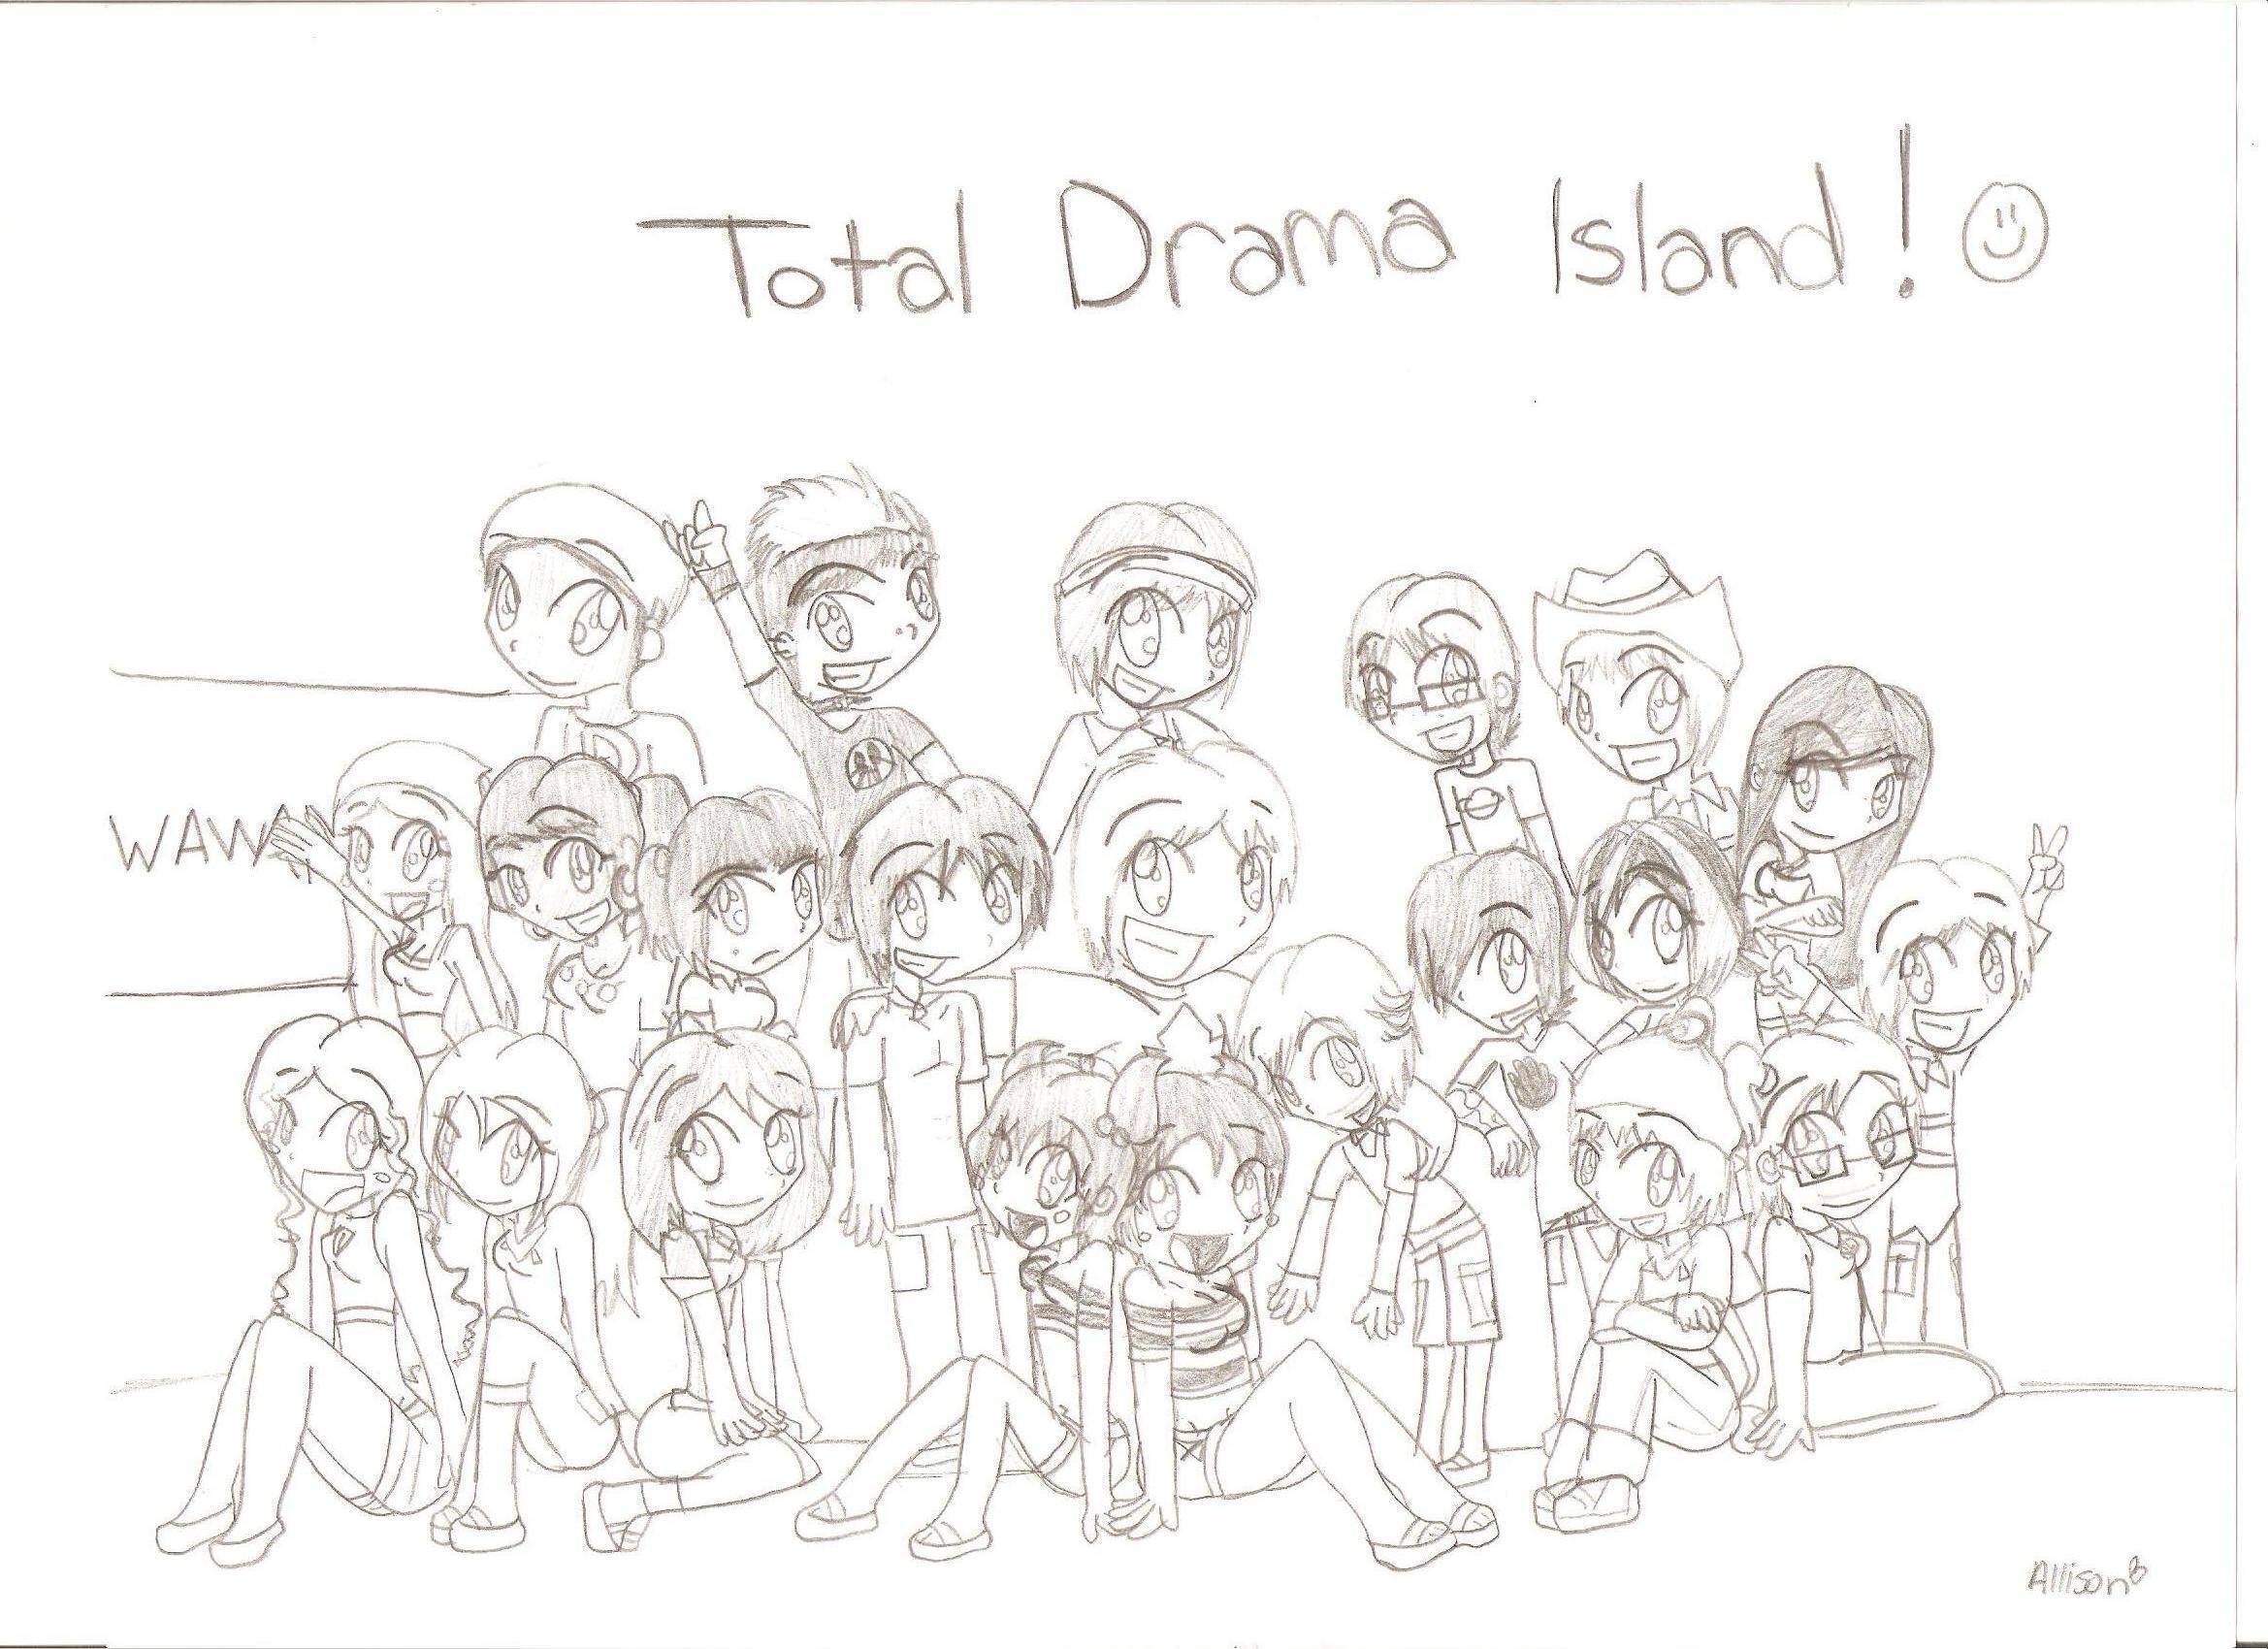 Total Drama Island Group